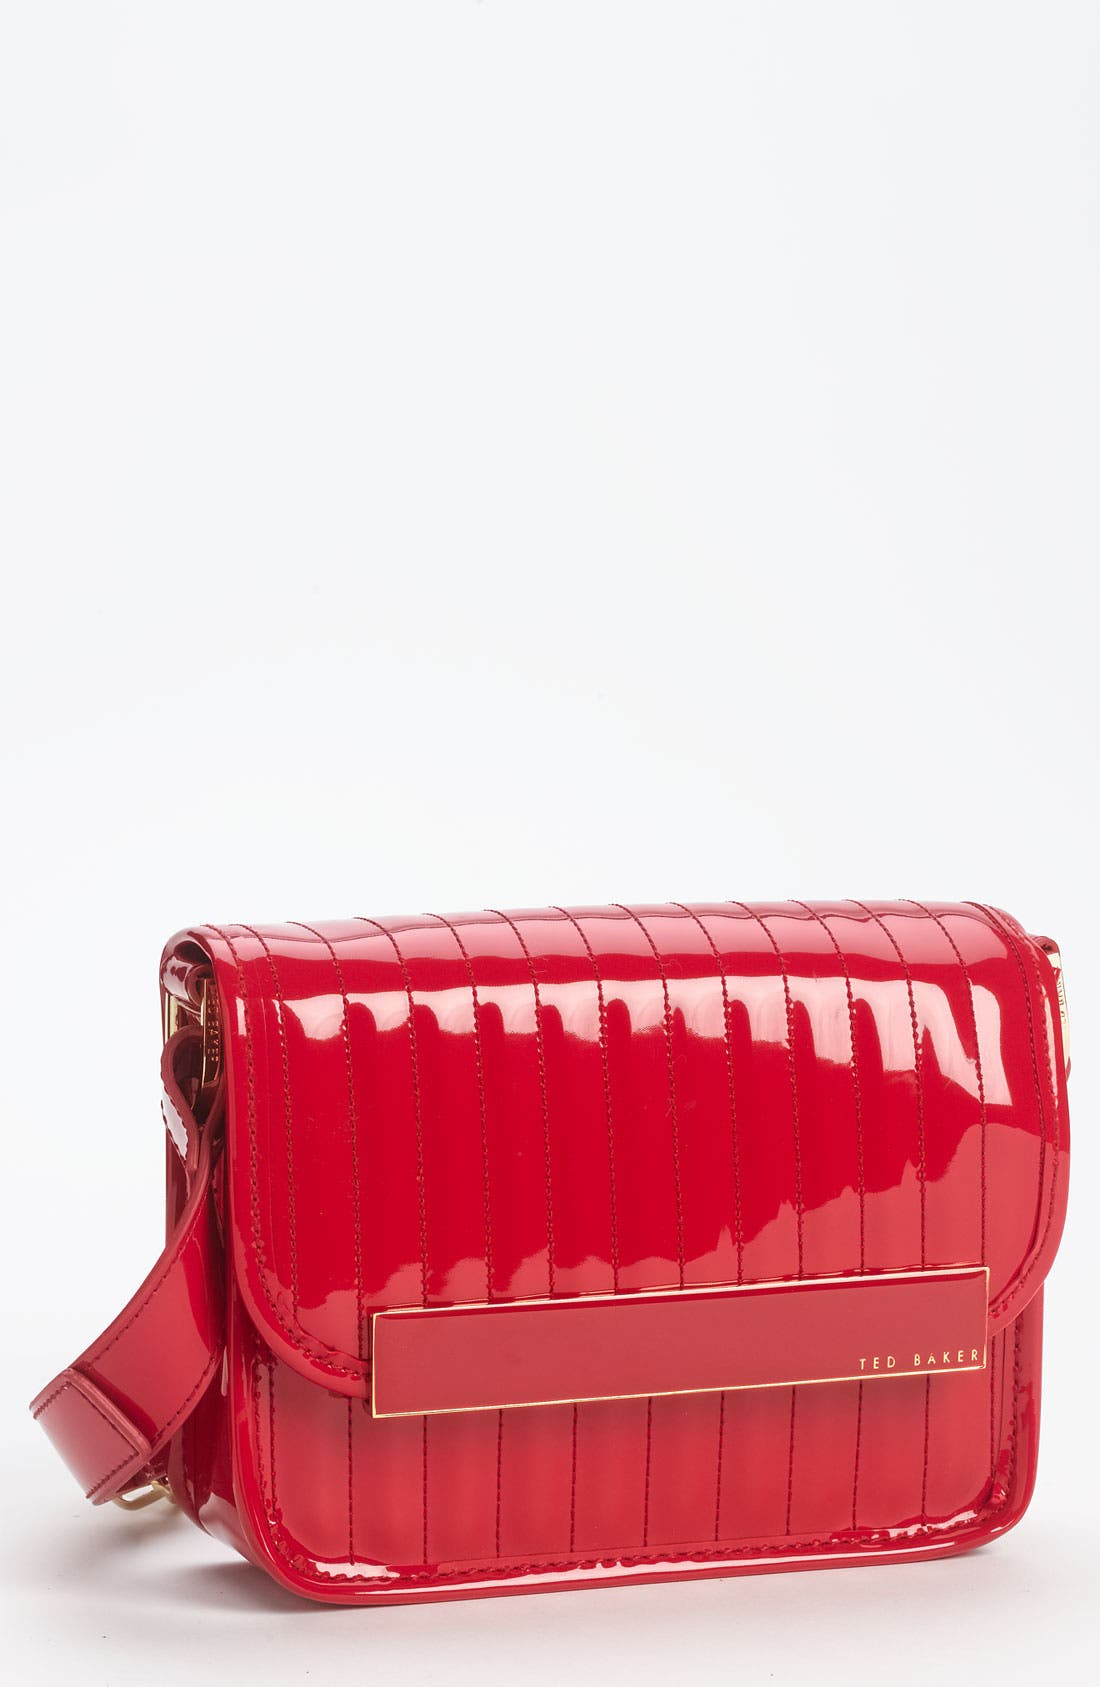 Main Image - Ted Baker London 'Small' Crossbody Bag